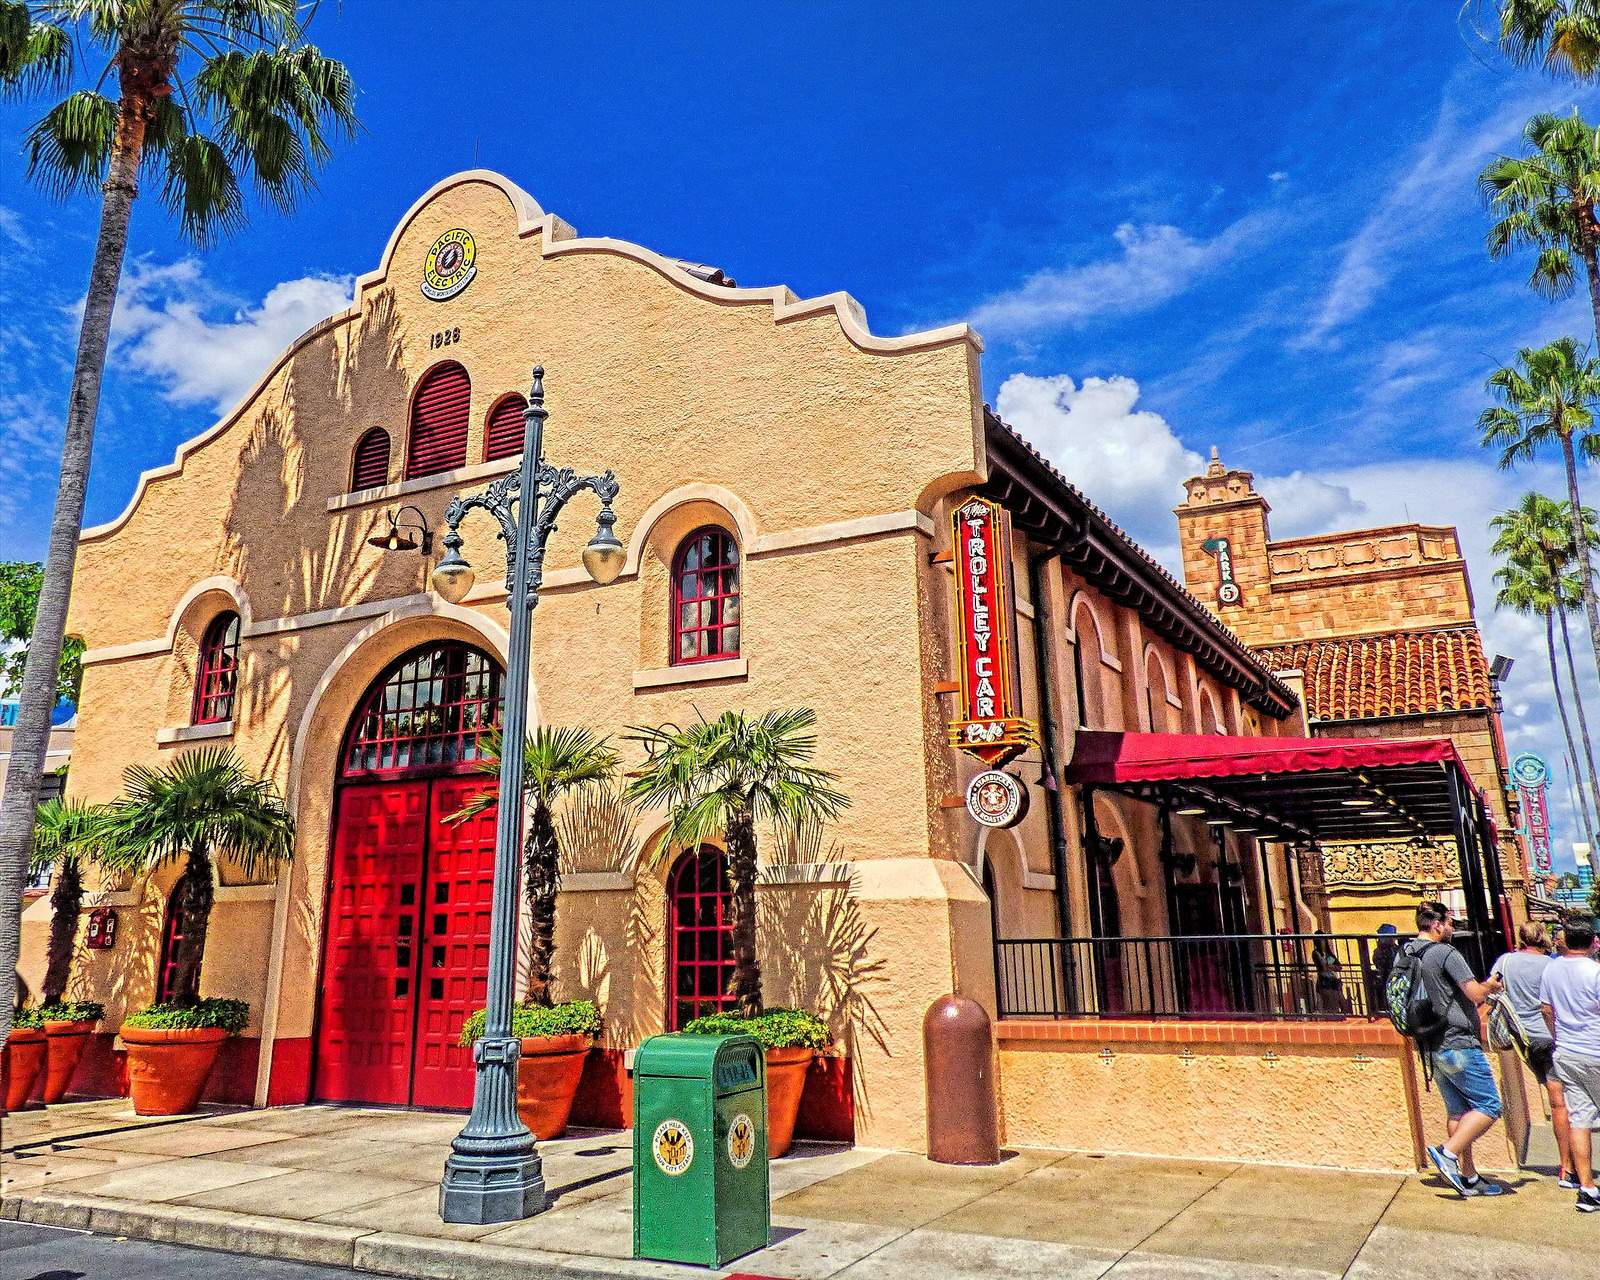 disney hollywood studios7 Disney Hollywood Studios Admission